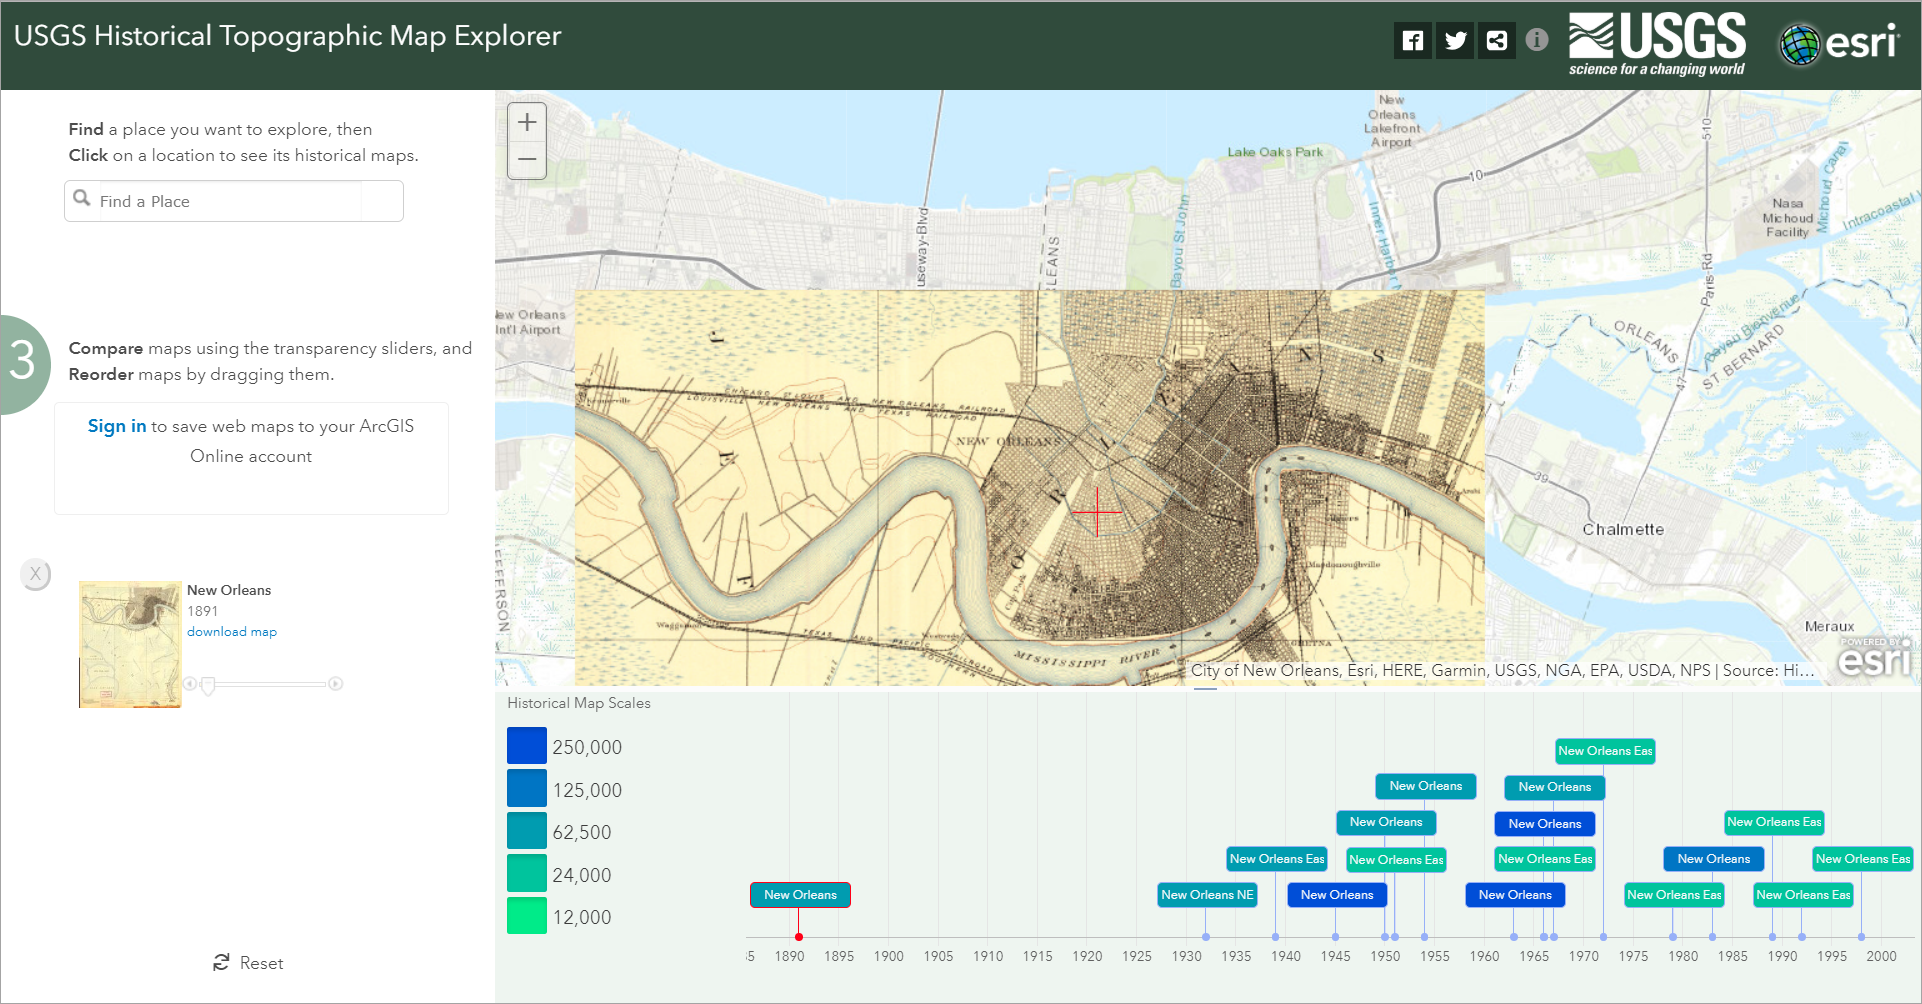 Web App - New Orleans